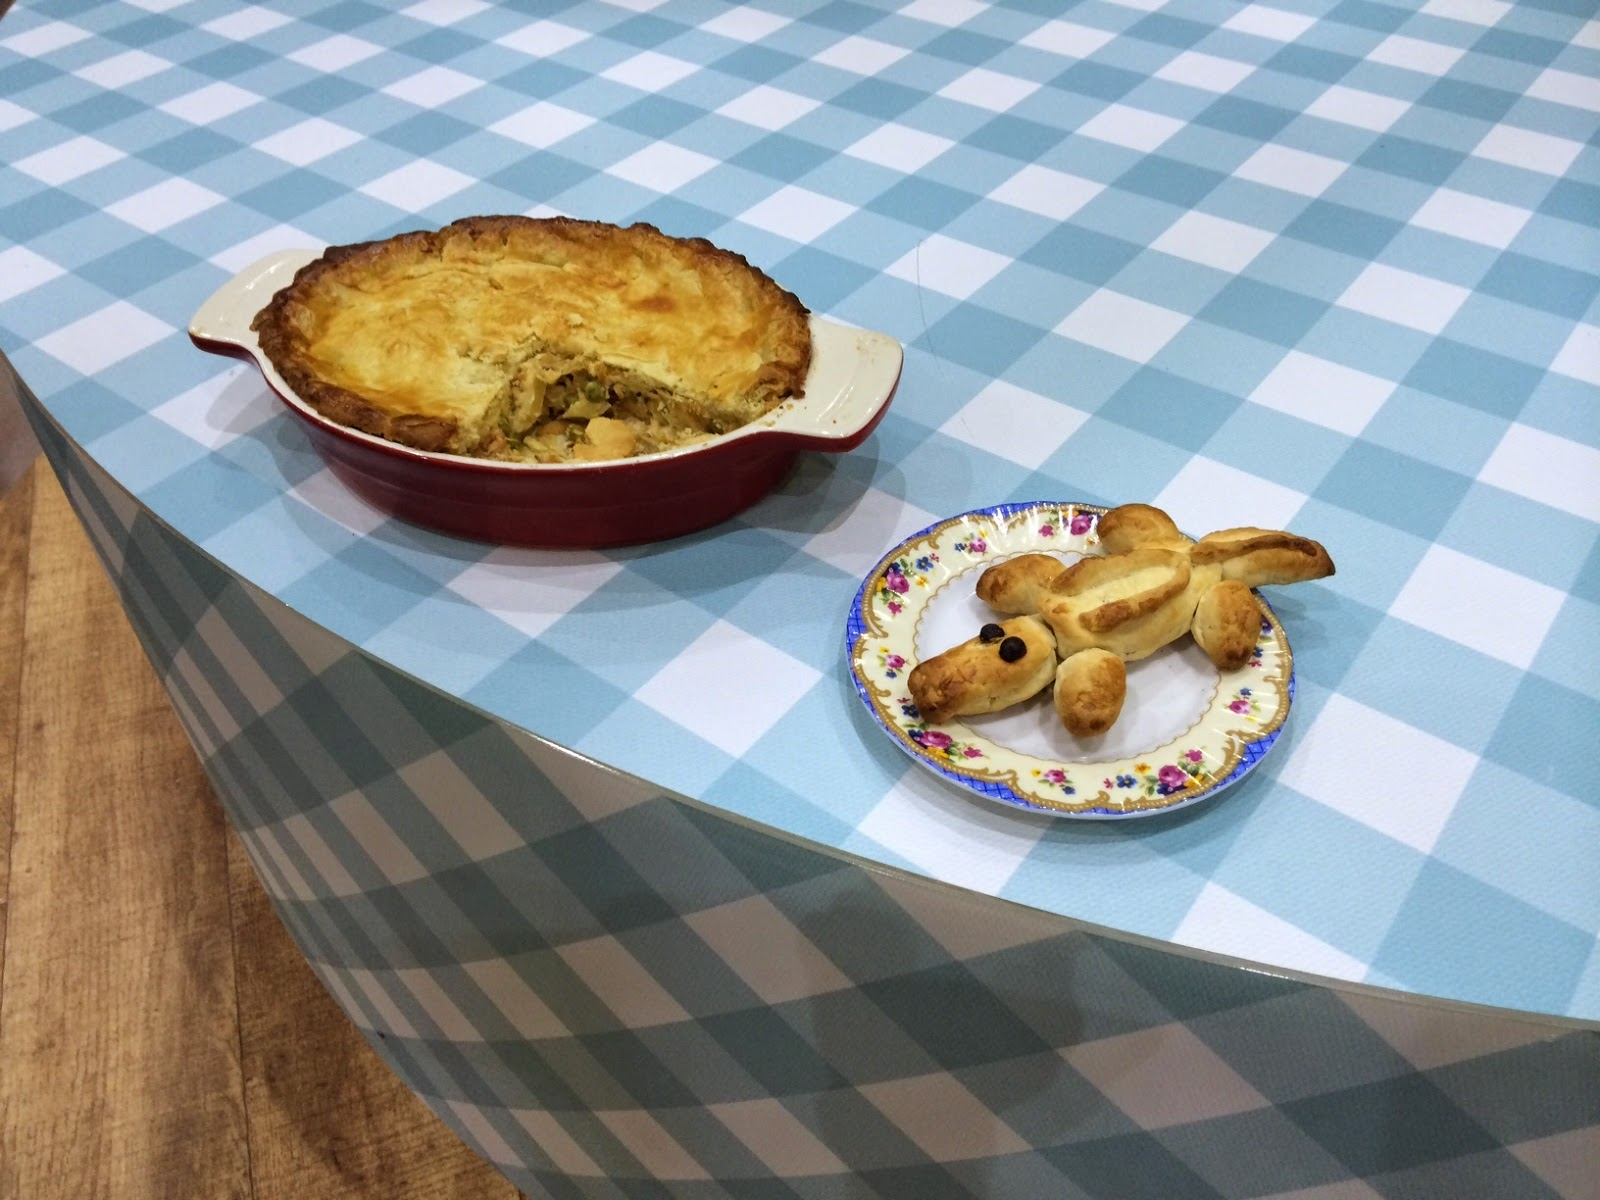 Crocodile Pie Review - Extra Slice Pies